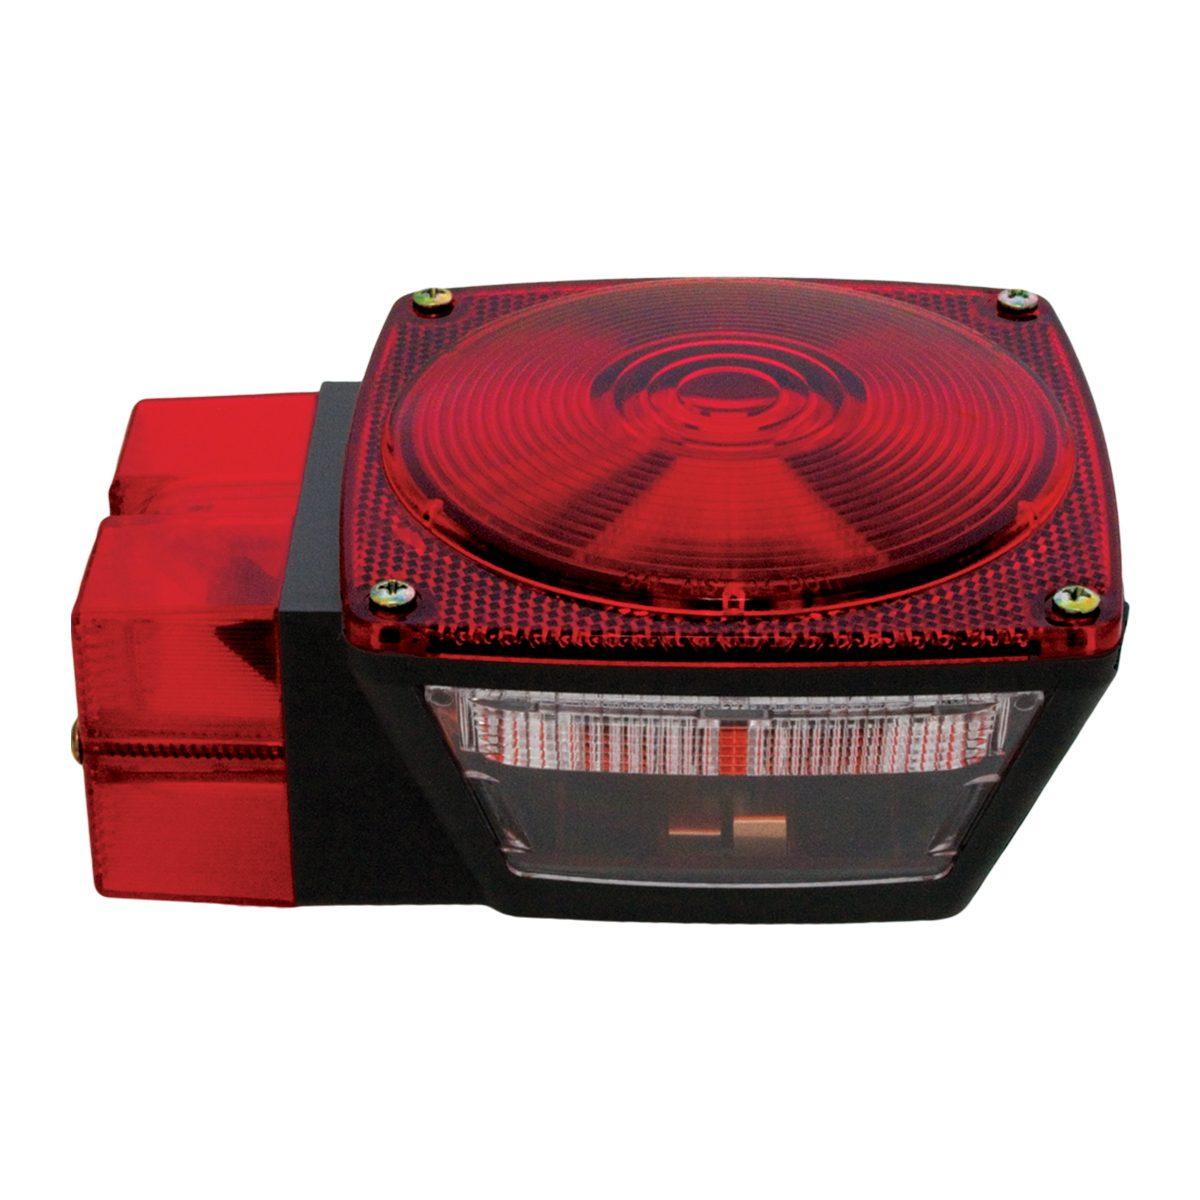 #77635 Universal Stud-Mount Trailer Roadside Light with License Light